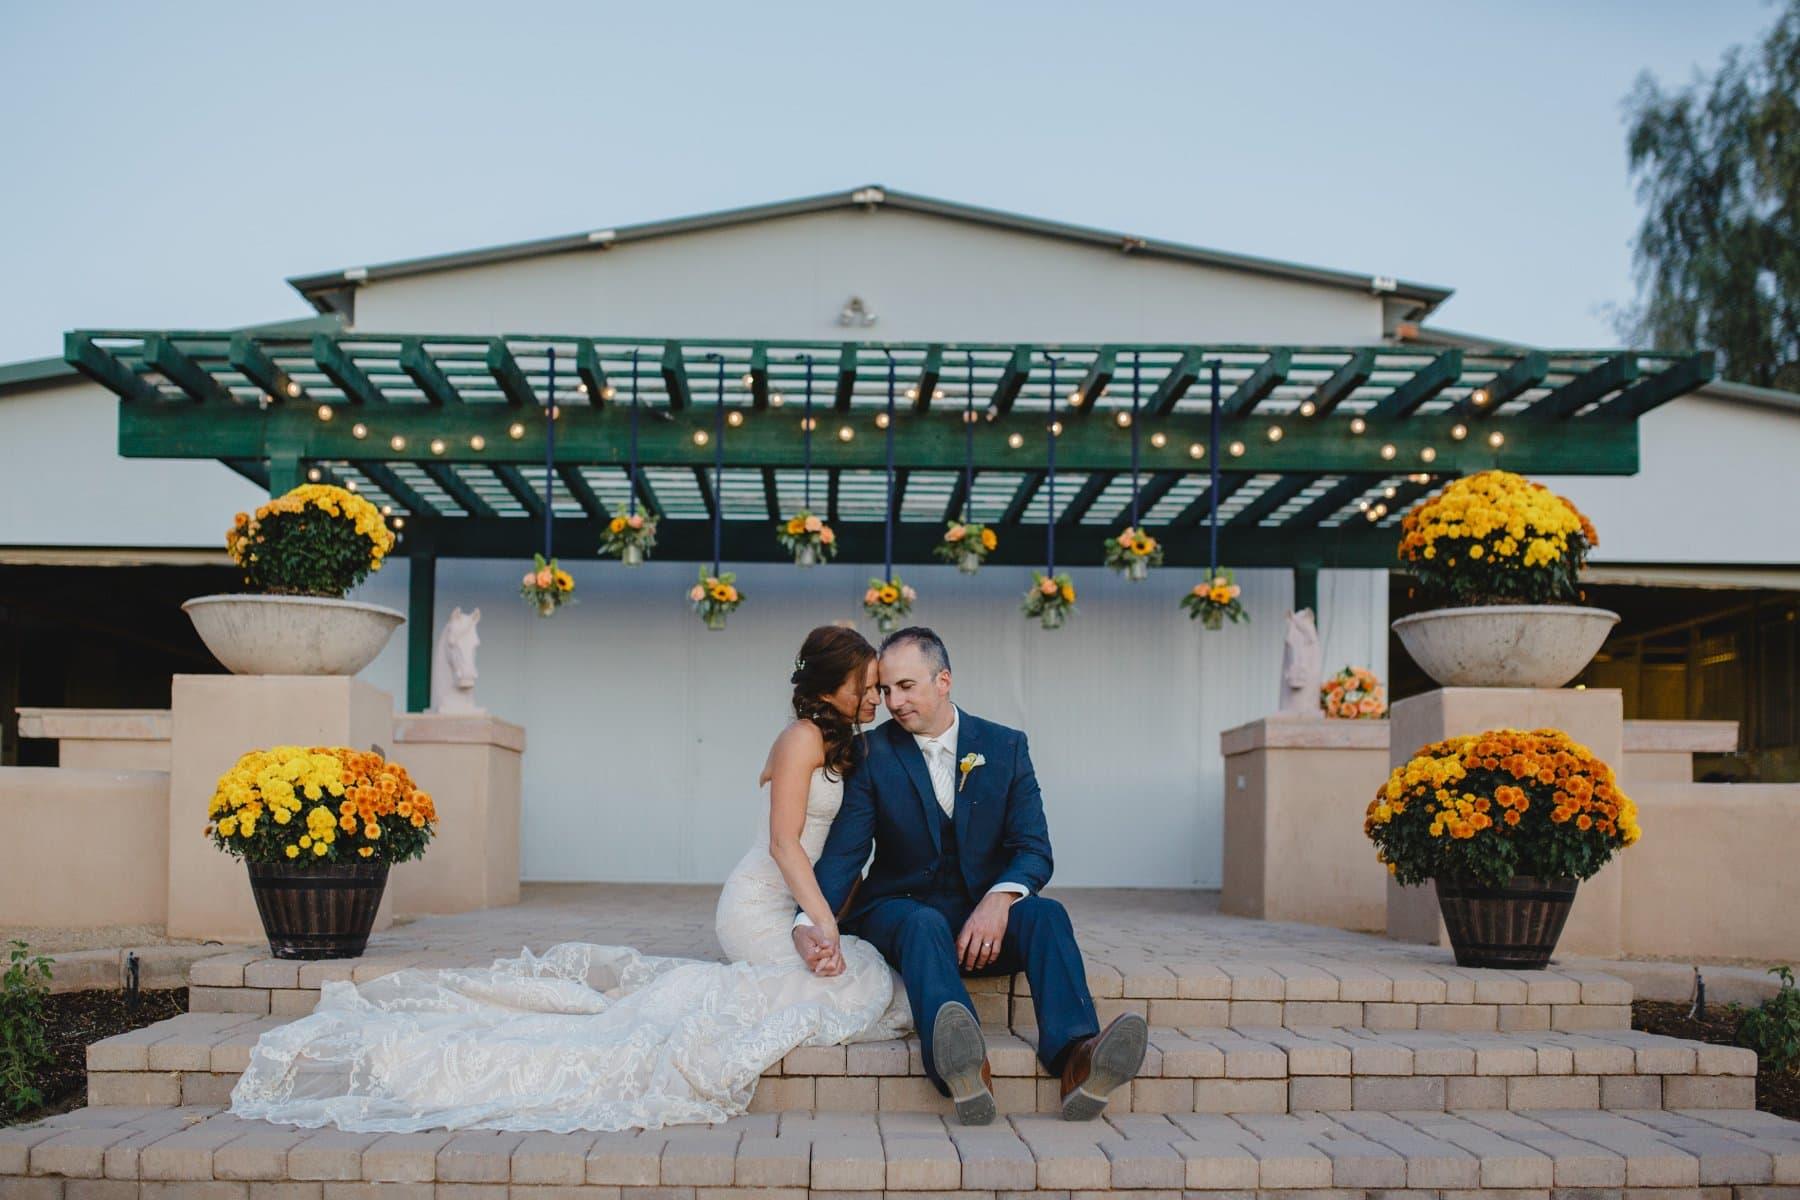 wedding at a Cave Creek horse barn in Arizona